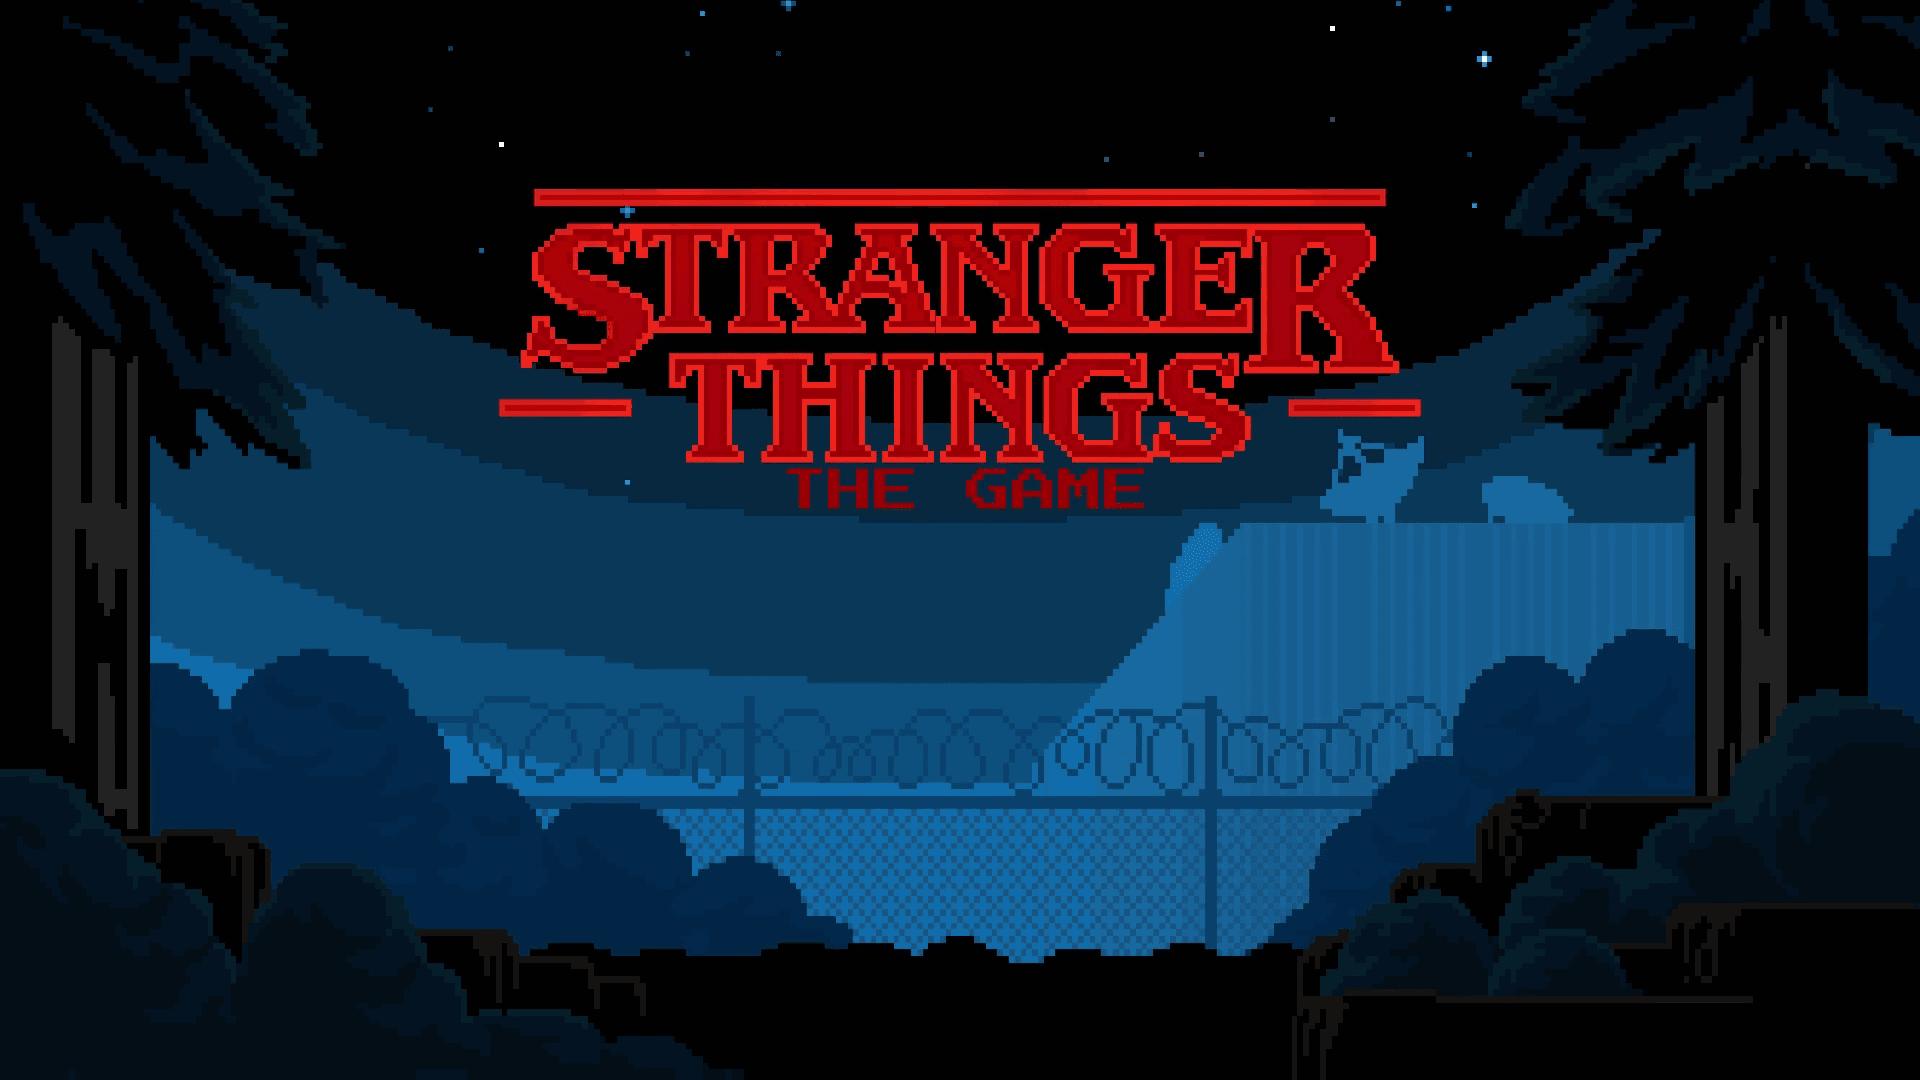 Stranger Things 3 The Game PC Version Full Game Free Download